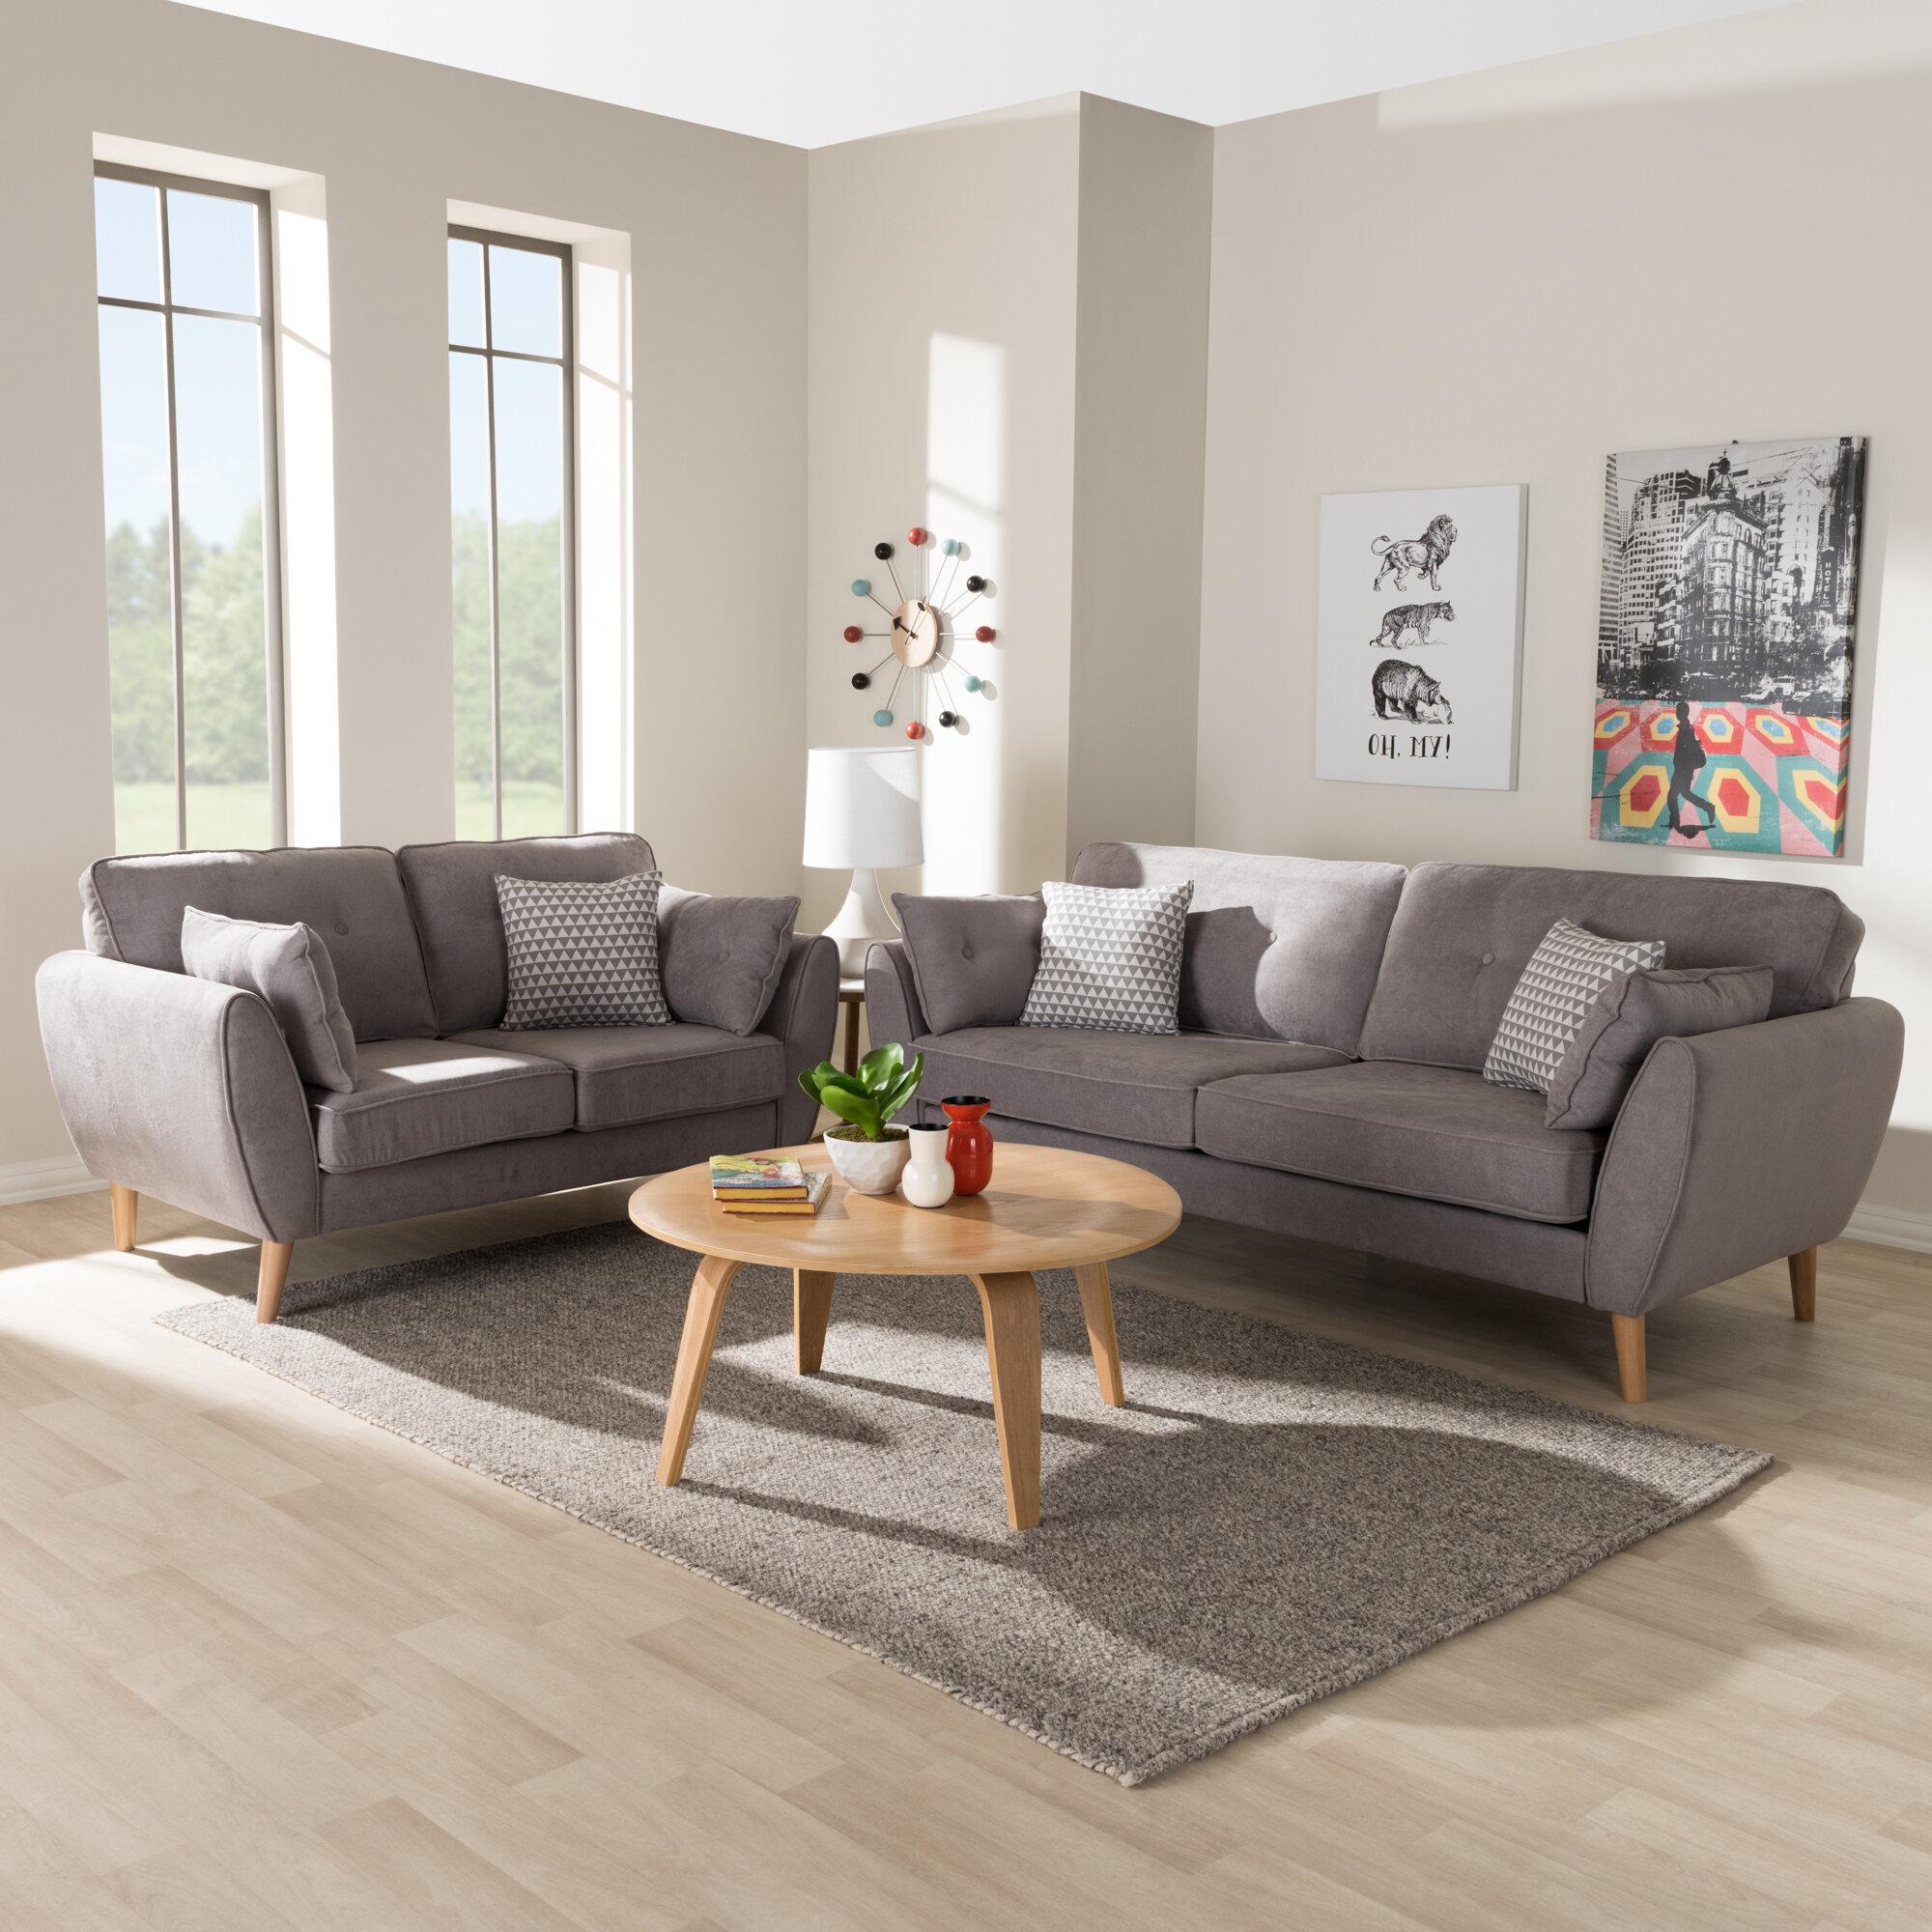 Doucette Mid Century Modern 2 Piece Button Tufted Living Room Set